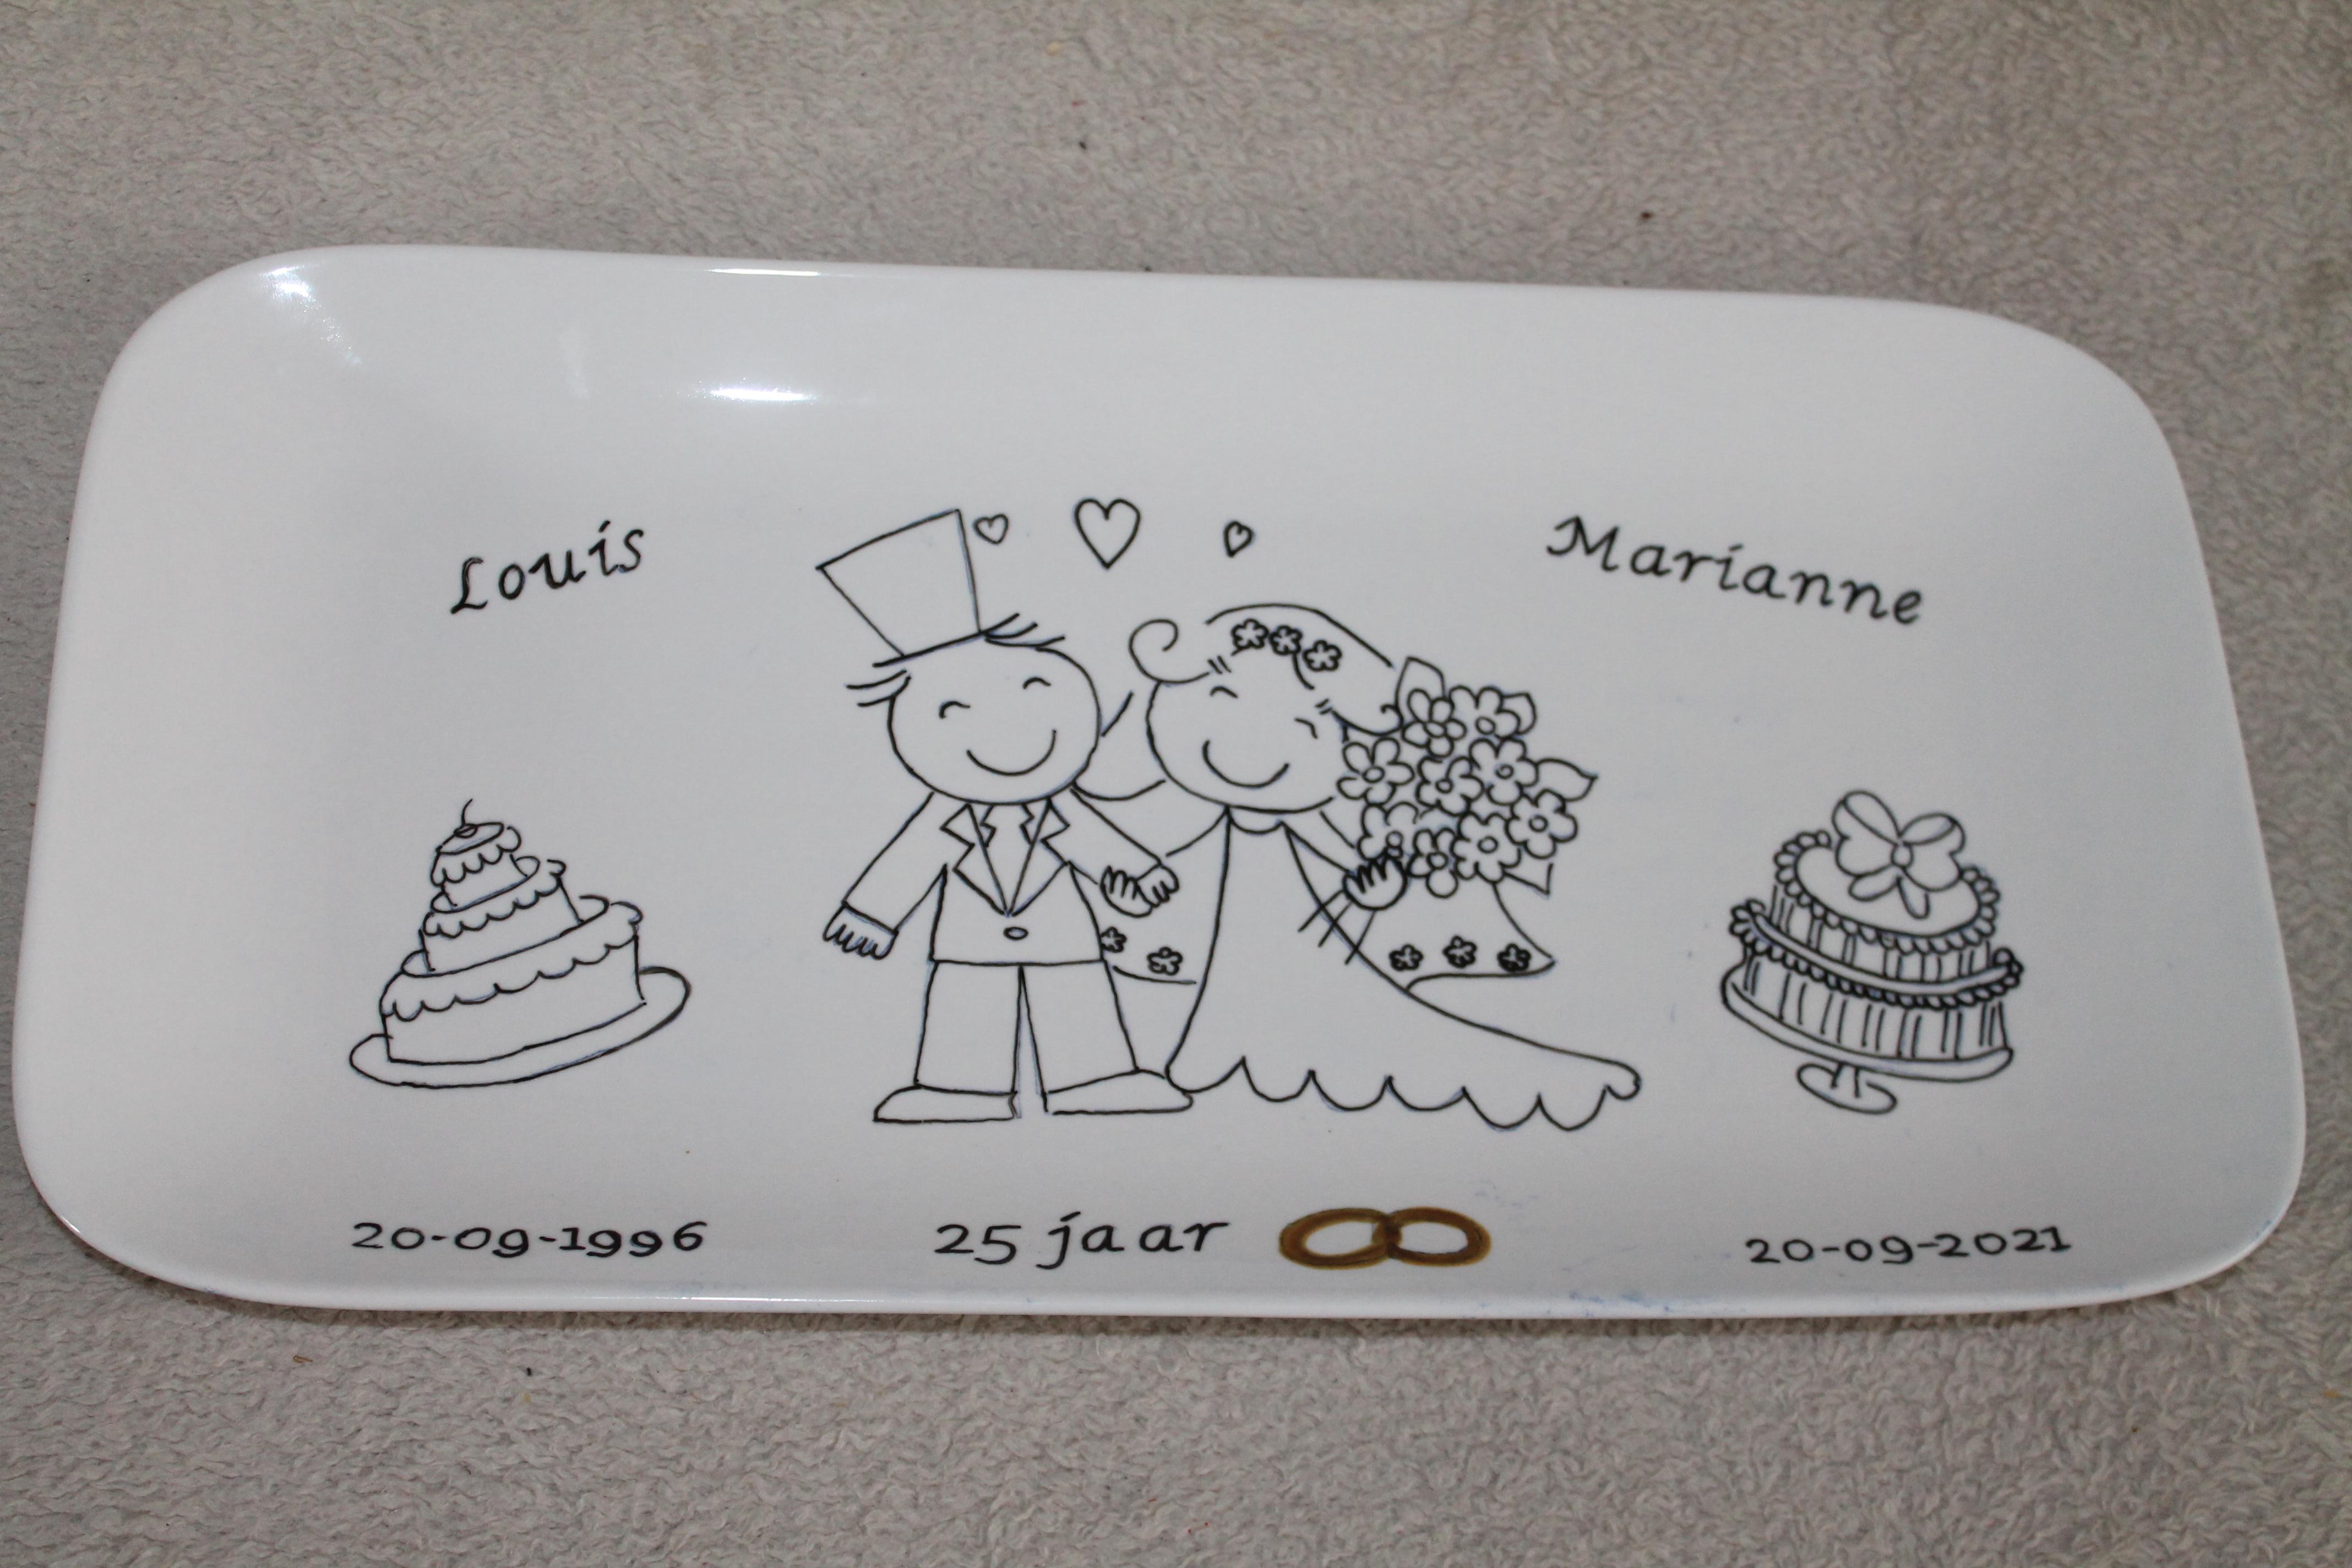 60 jaar getrouwd kado Bekend Origineel Cadeau 12 5 Jaar Getrouwd @NN21  60 jaar getrouwd kado